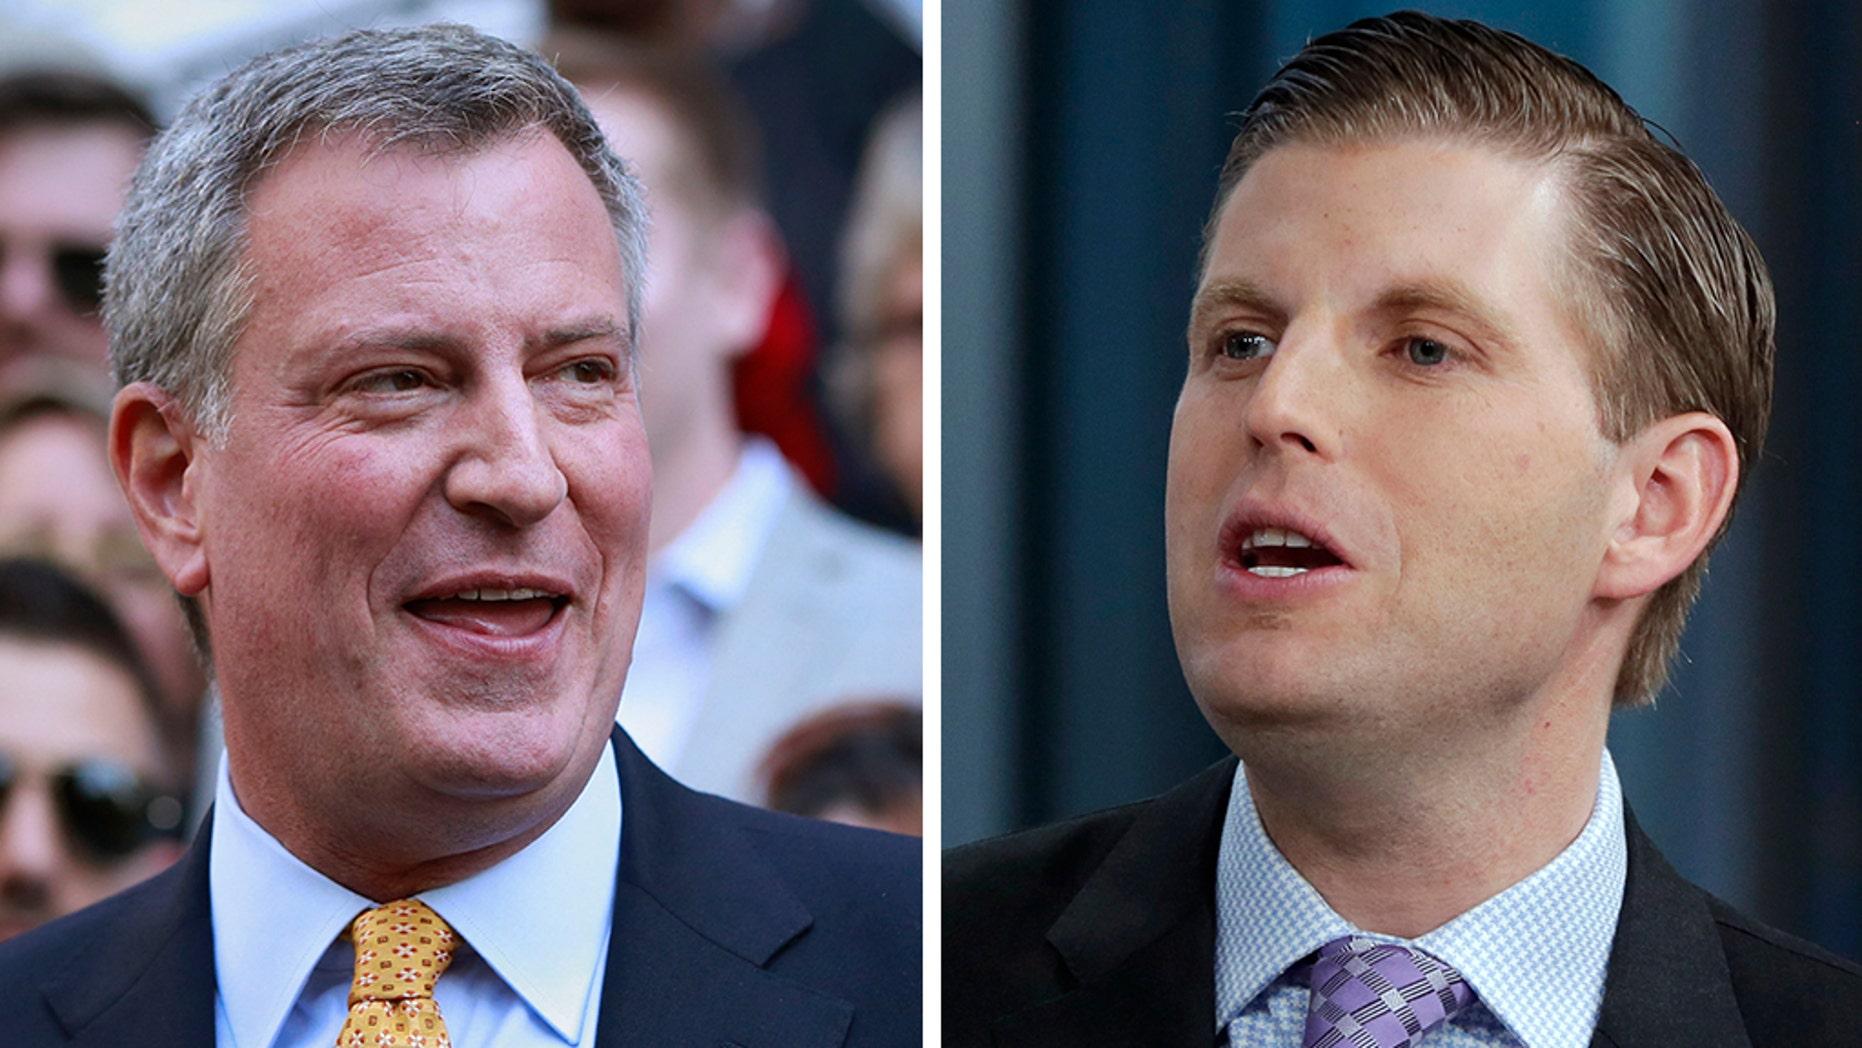 Westlake Legal Group DeBalsio-Eric-Trump Eric Trump clashes with Bill De Blasio on Twitter over New York City, Green New Deal Joseph Wulfsohn fox-news/politics fox-news/entertainment/media fox news fnc/politics fnc b718d003-f352-5bd1-a191-cd8ee7149794 article